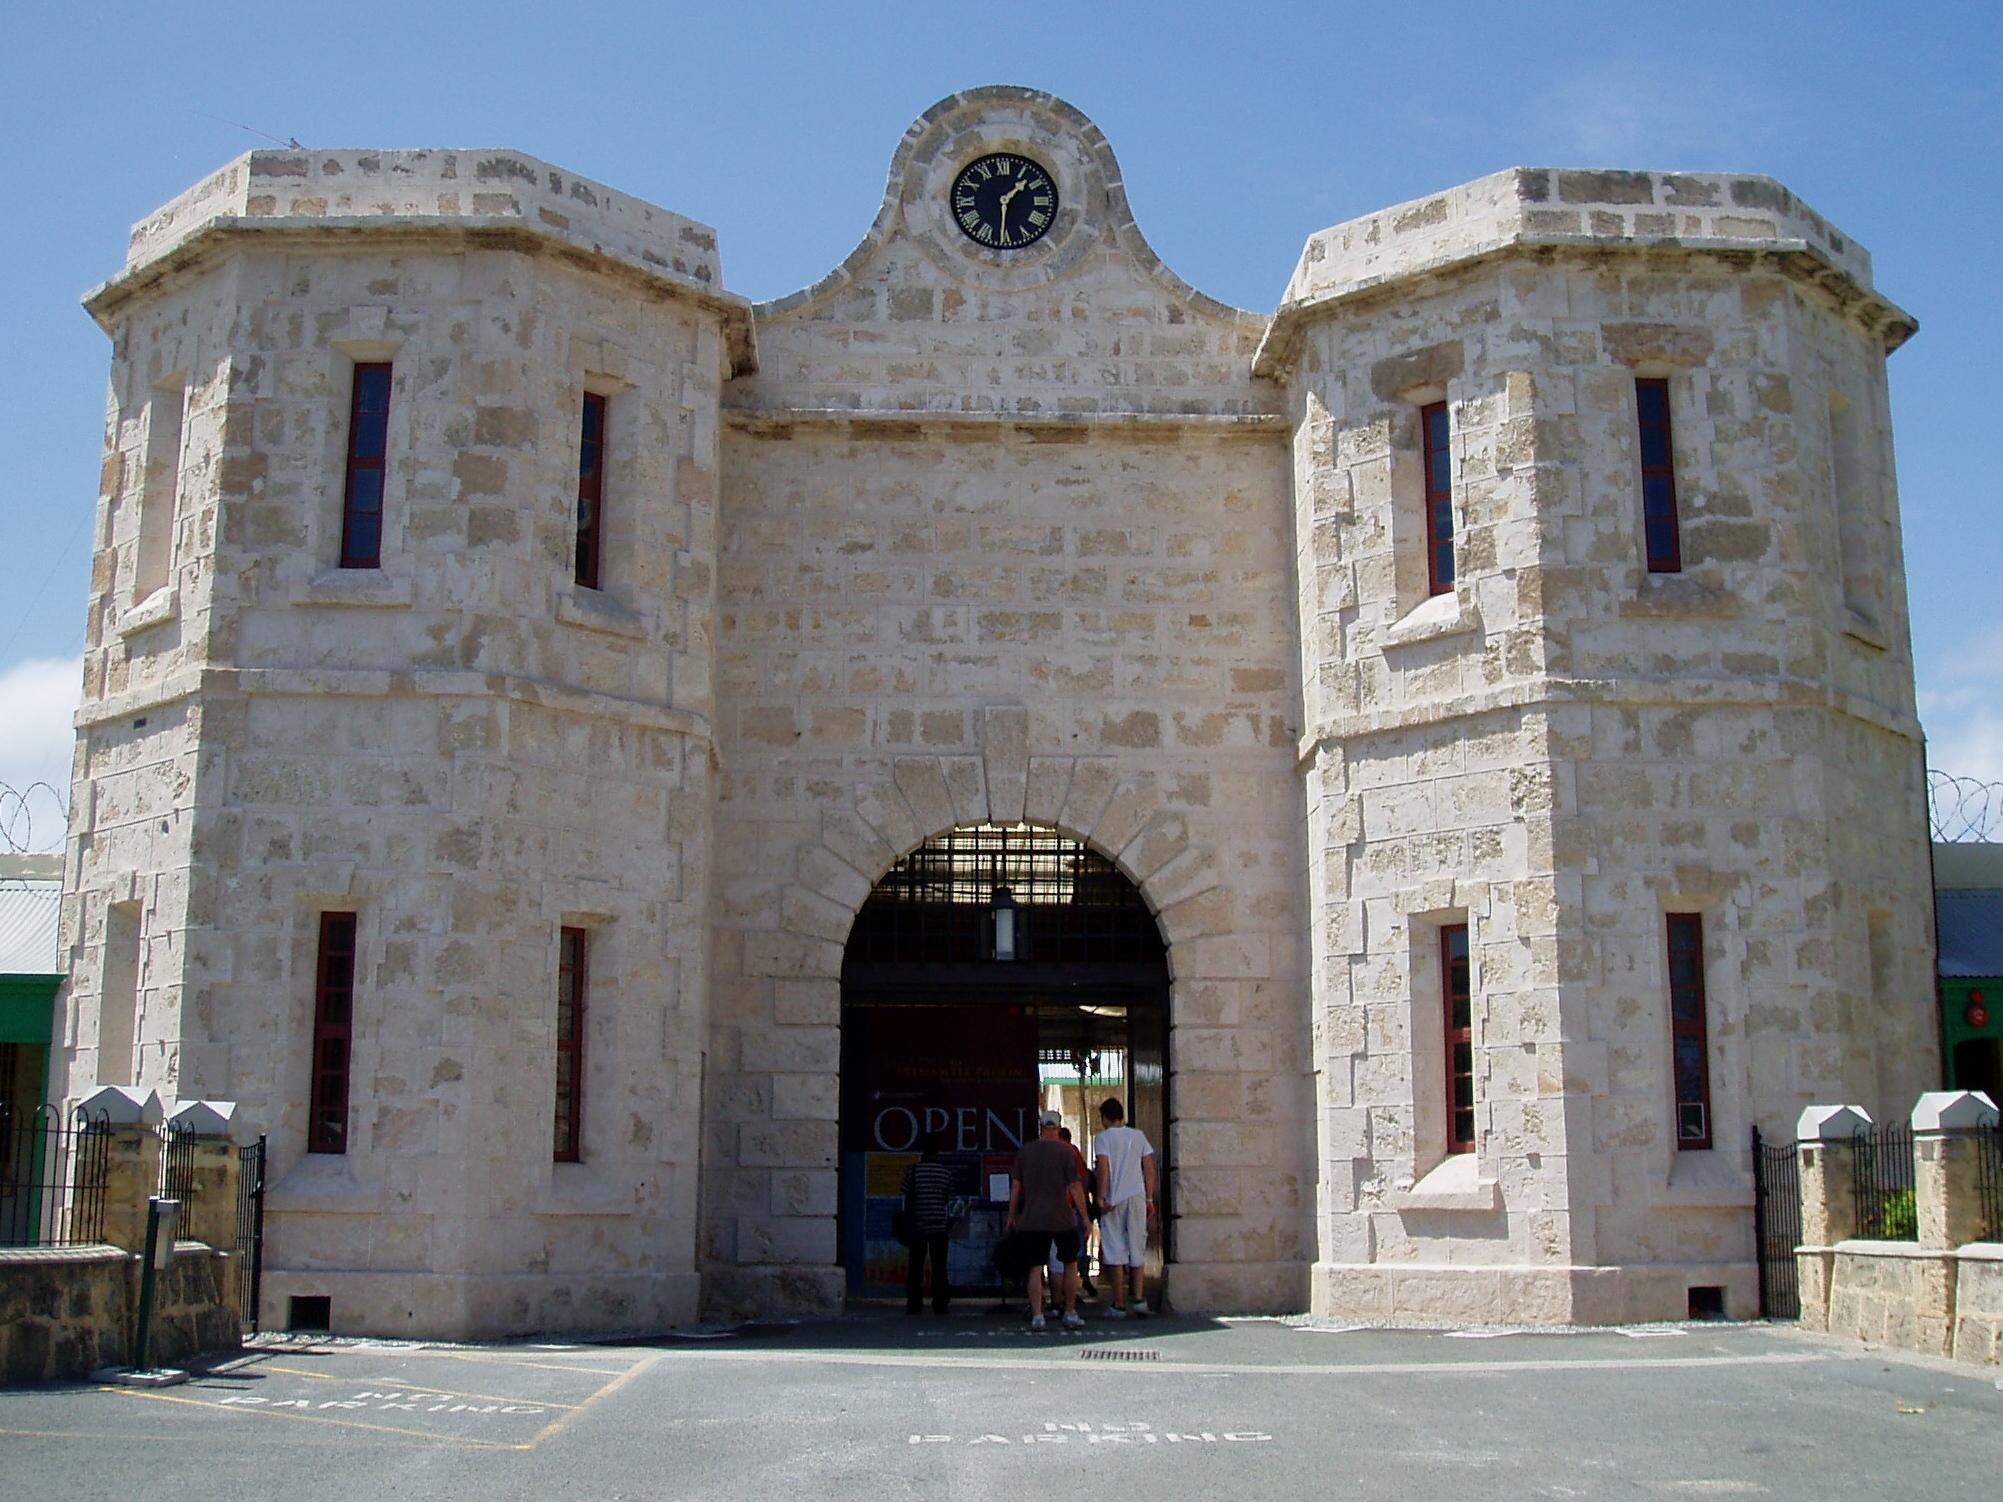 Stone building